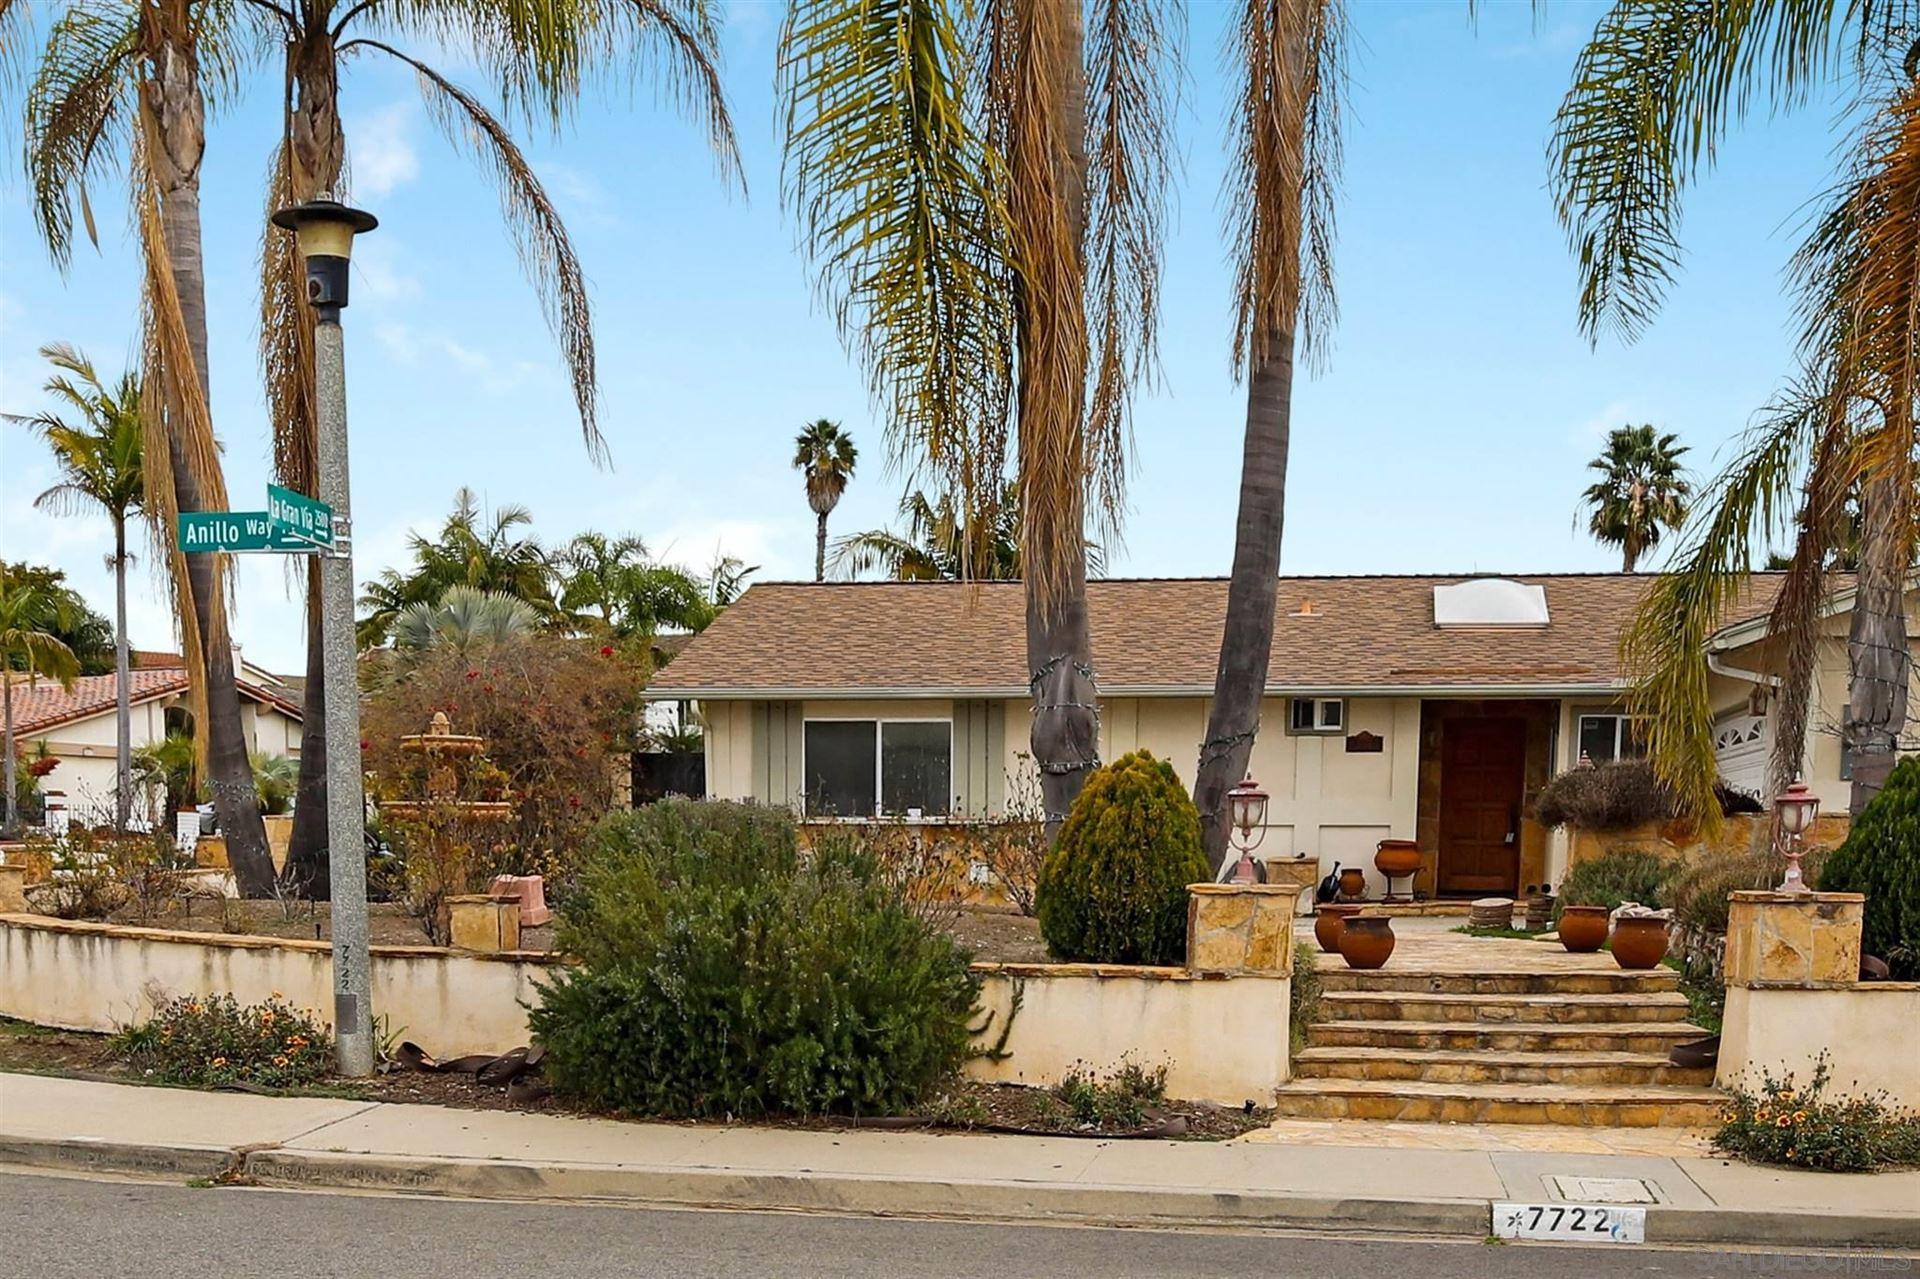 Photo of 7722 Anillo Way, Carlsbad, CA 92009 (MLS # 210001838)